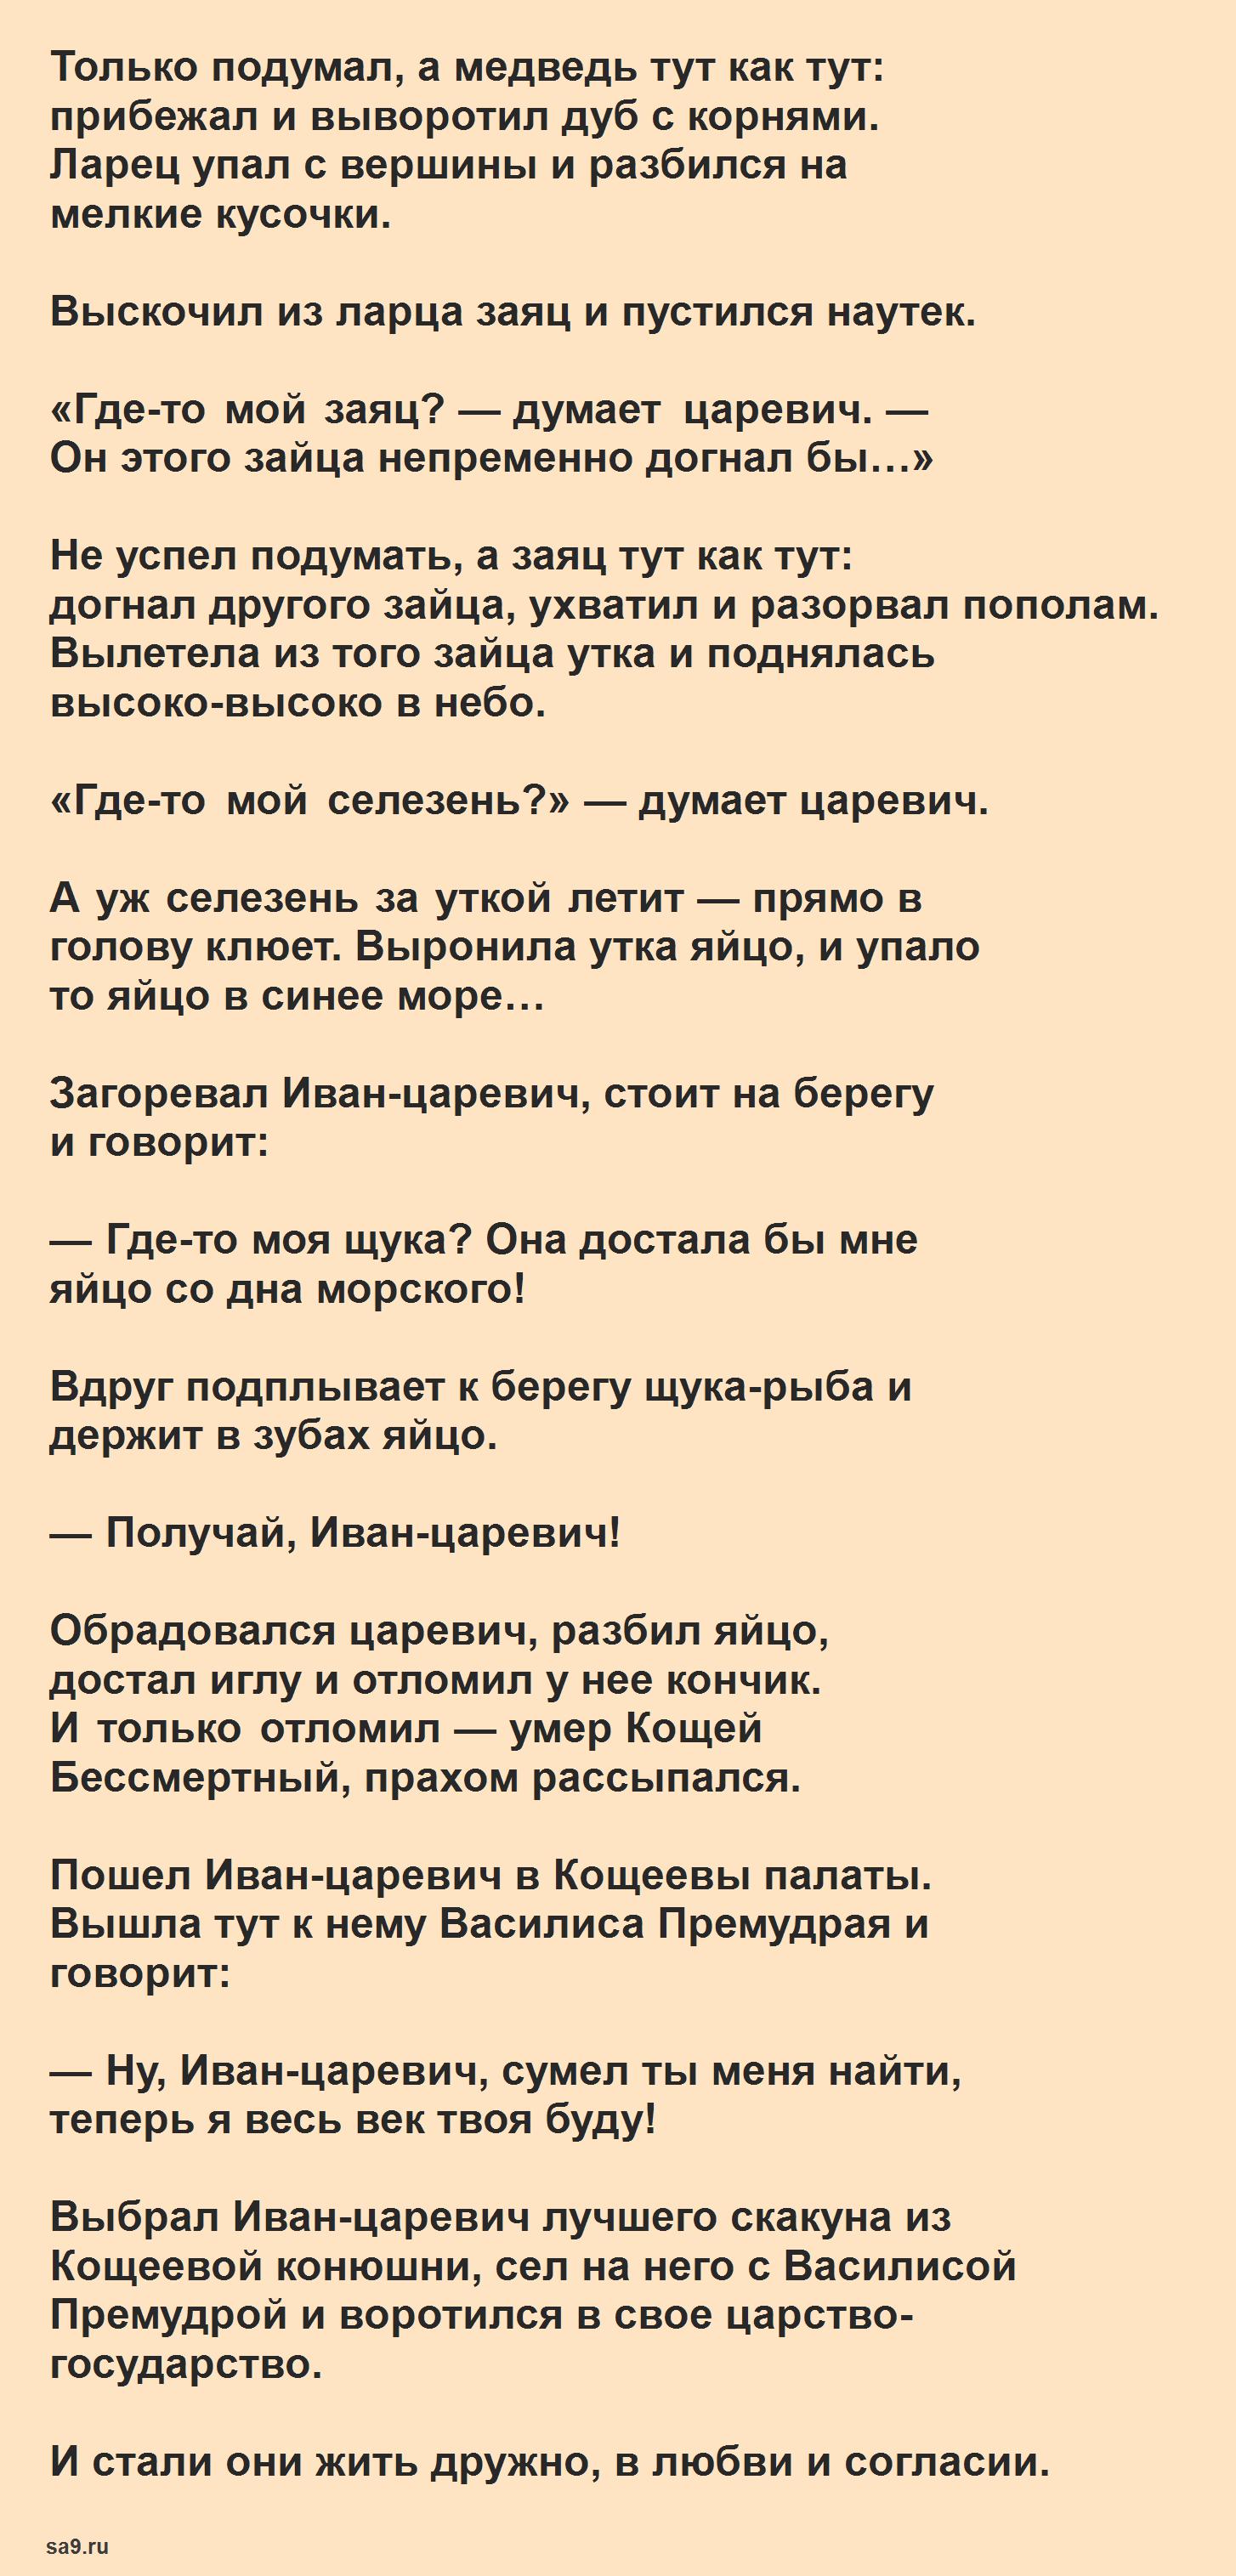 Русская народная сказка для детей – Царевна лягушка